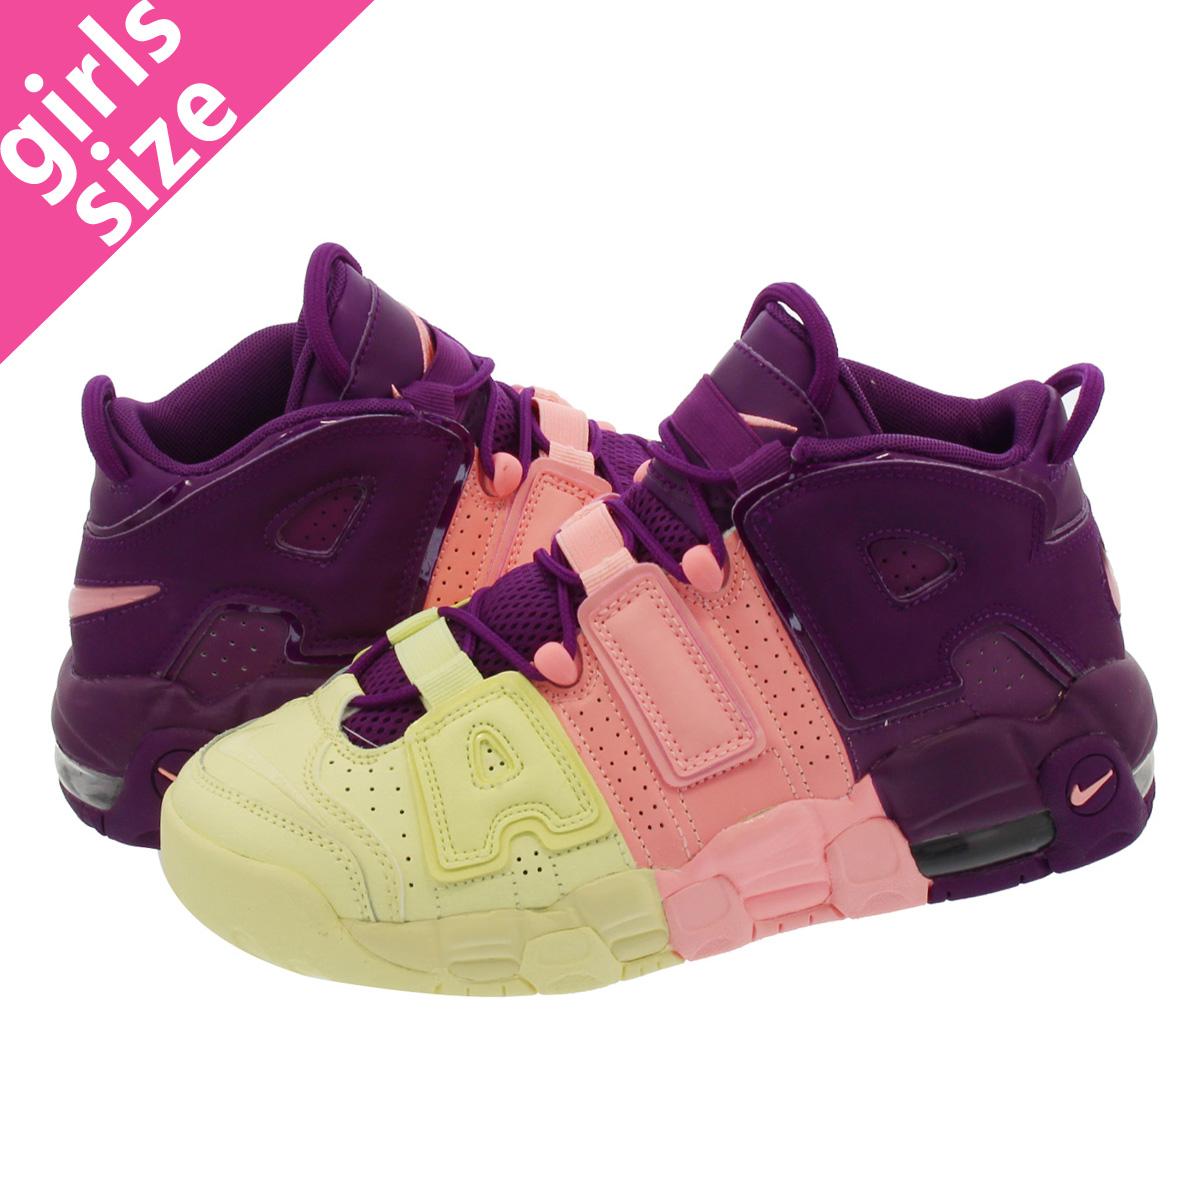 5138ad4e3de SELECT SHOP LOWTEX  NIKE AIR MORE UPTEMPO GS Nike more up tempo GS CITRON  PINK BRIGHT PURPLE NIGHT GRAPE